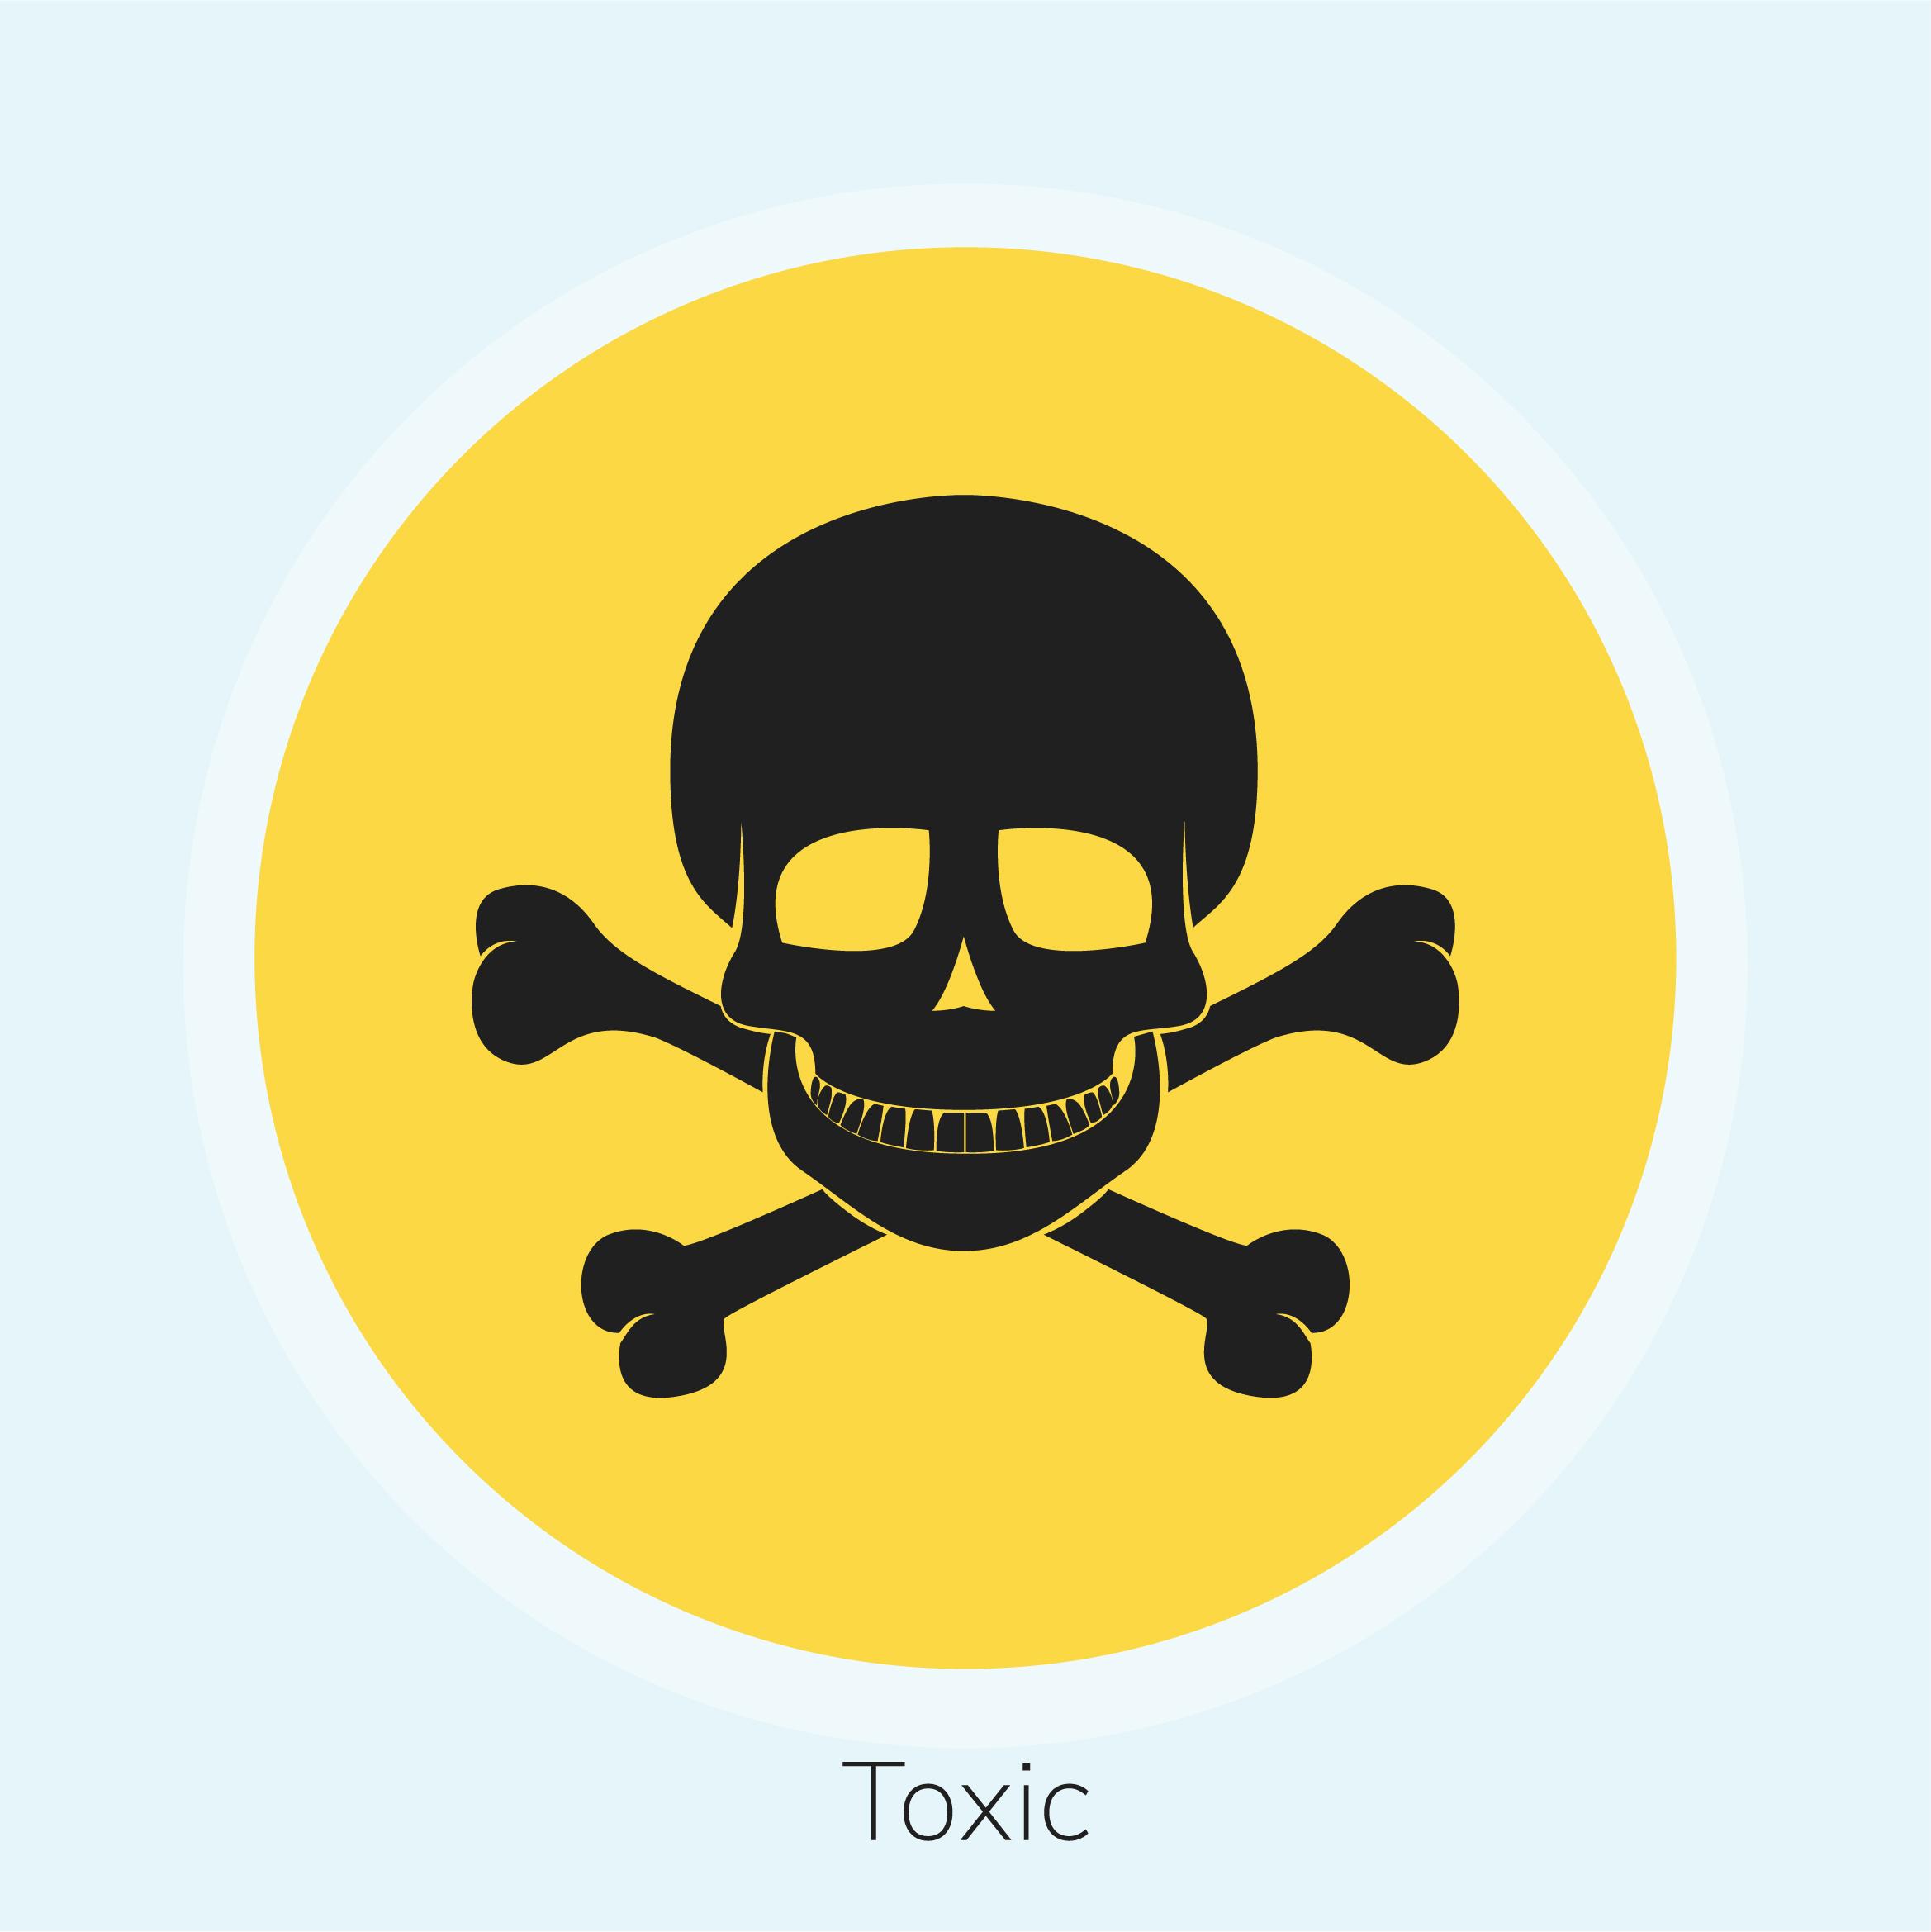 Toxic Symbol Free Vector Art - (535 Free Downloads)